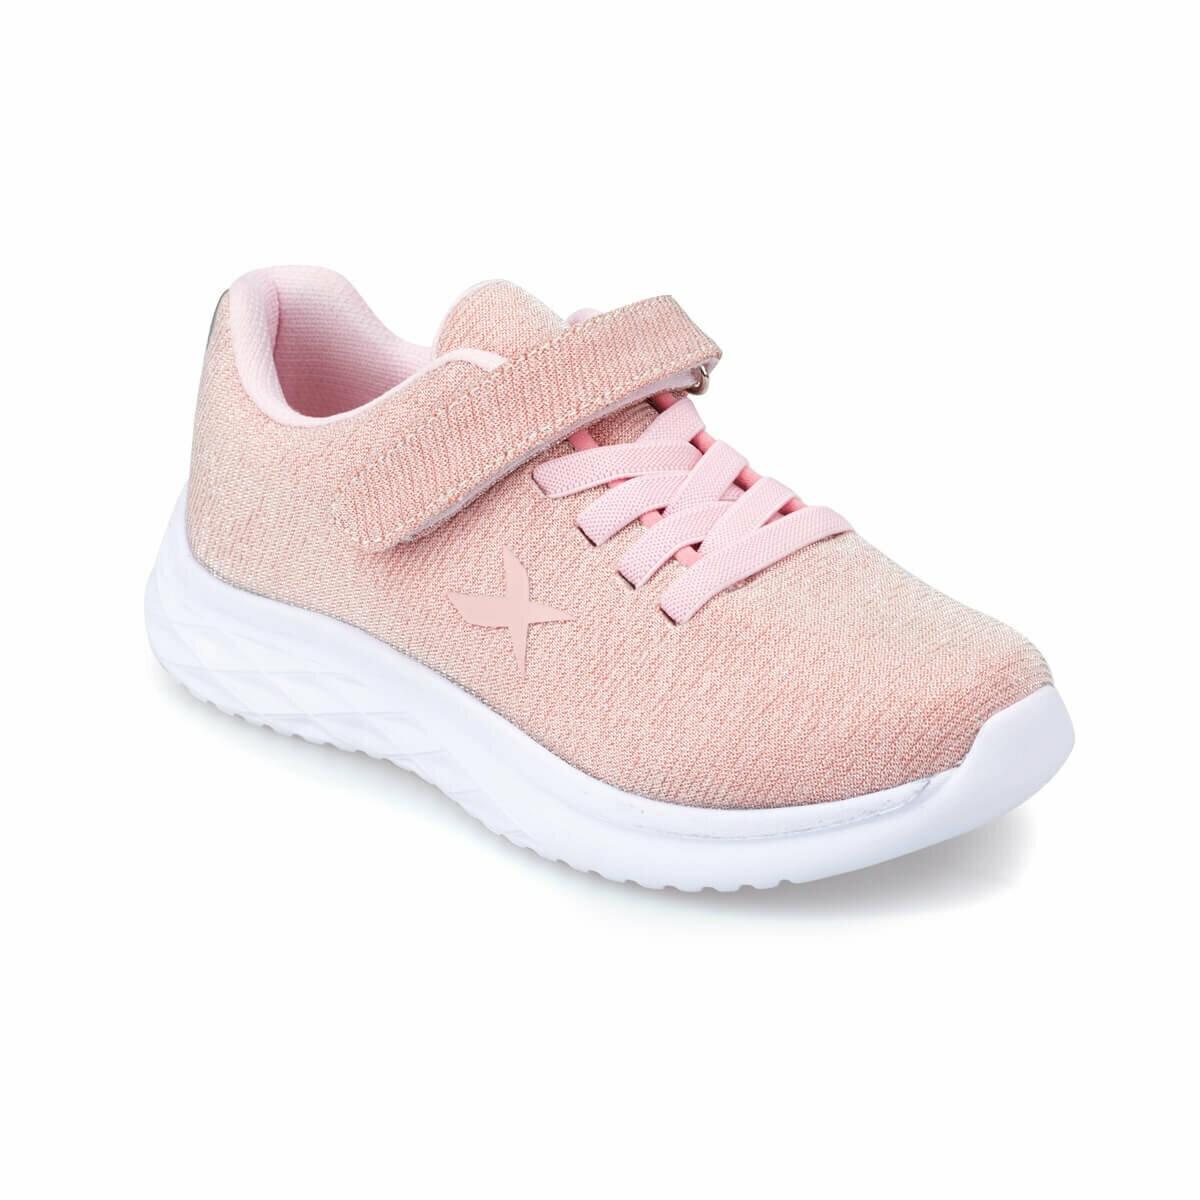 FLO VERNA Pink Female Child Walking Shoes KINETIX